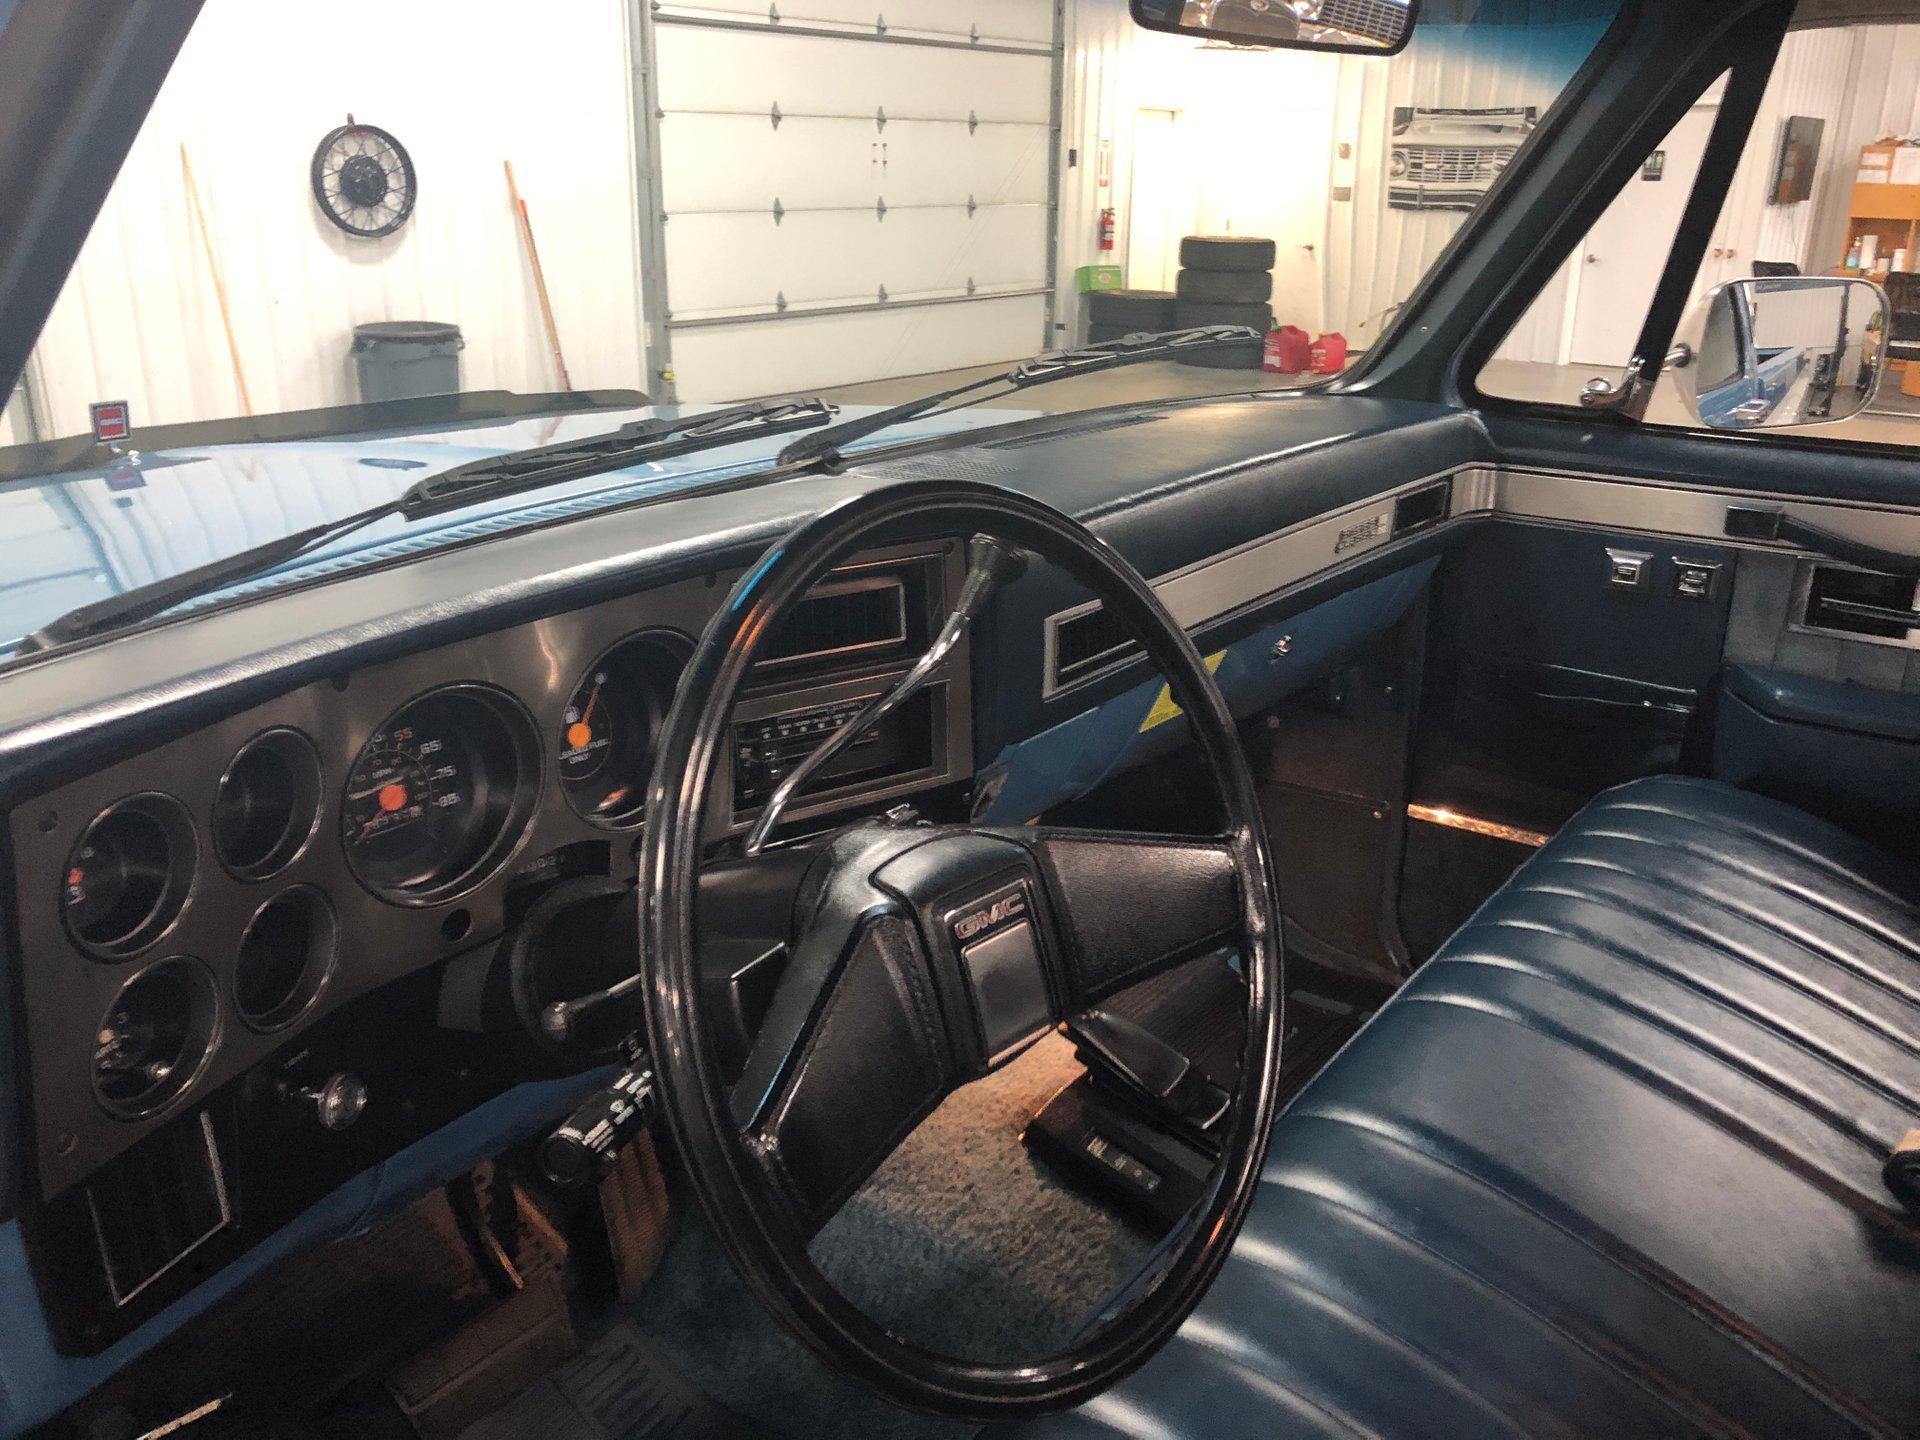 1987 GMC K20 | 4-Wheel Classics/Classic Car, Truck, and SUV Sales